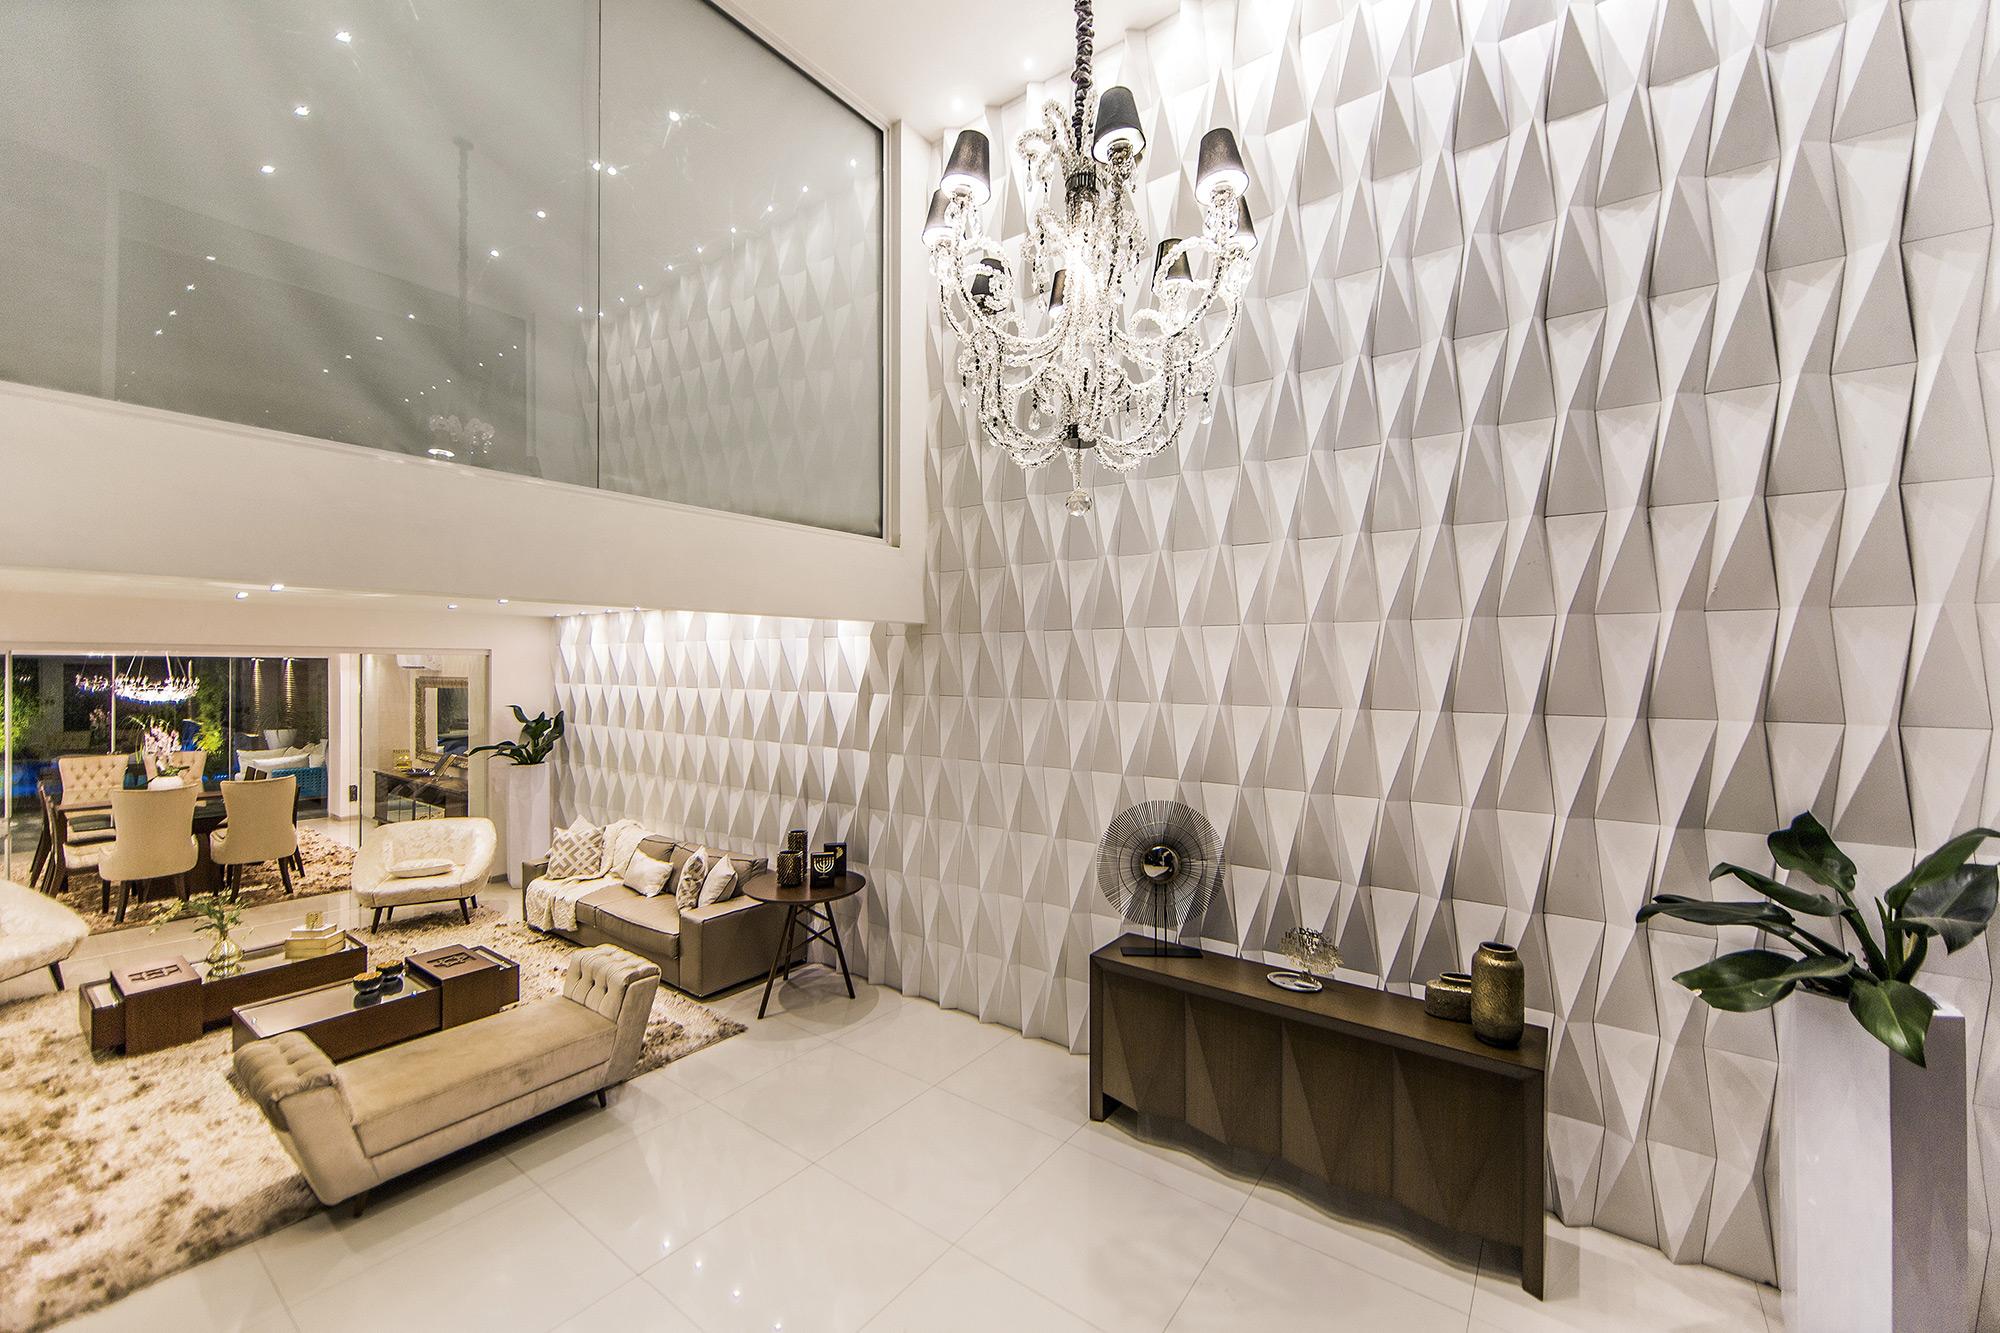 Origami Paris Branco -Arquiteto Boliviano Victor Coimbra Chavez